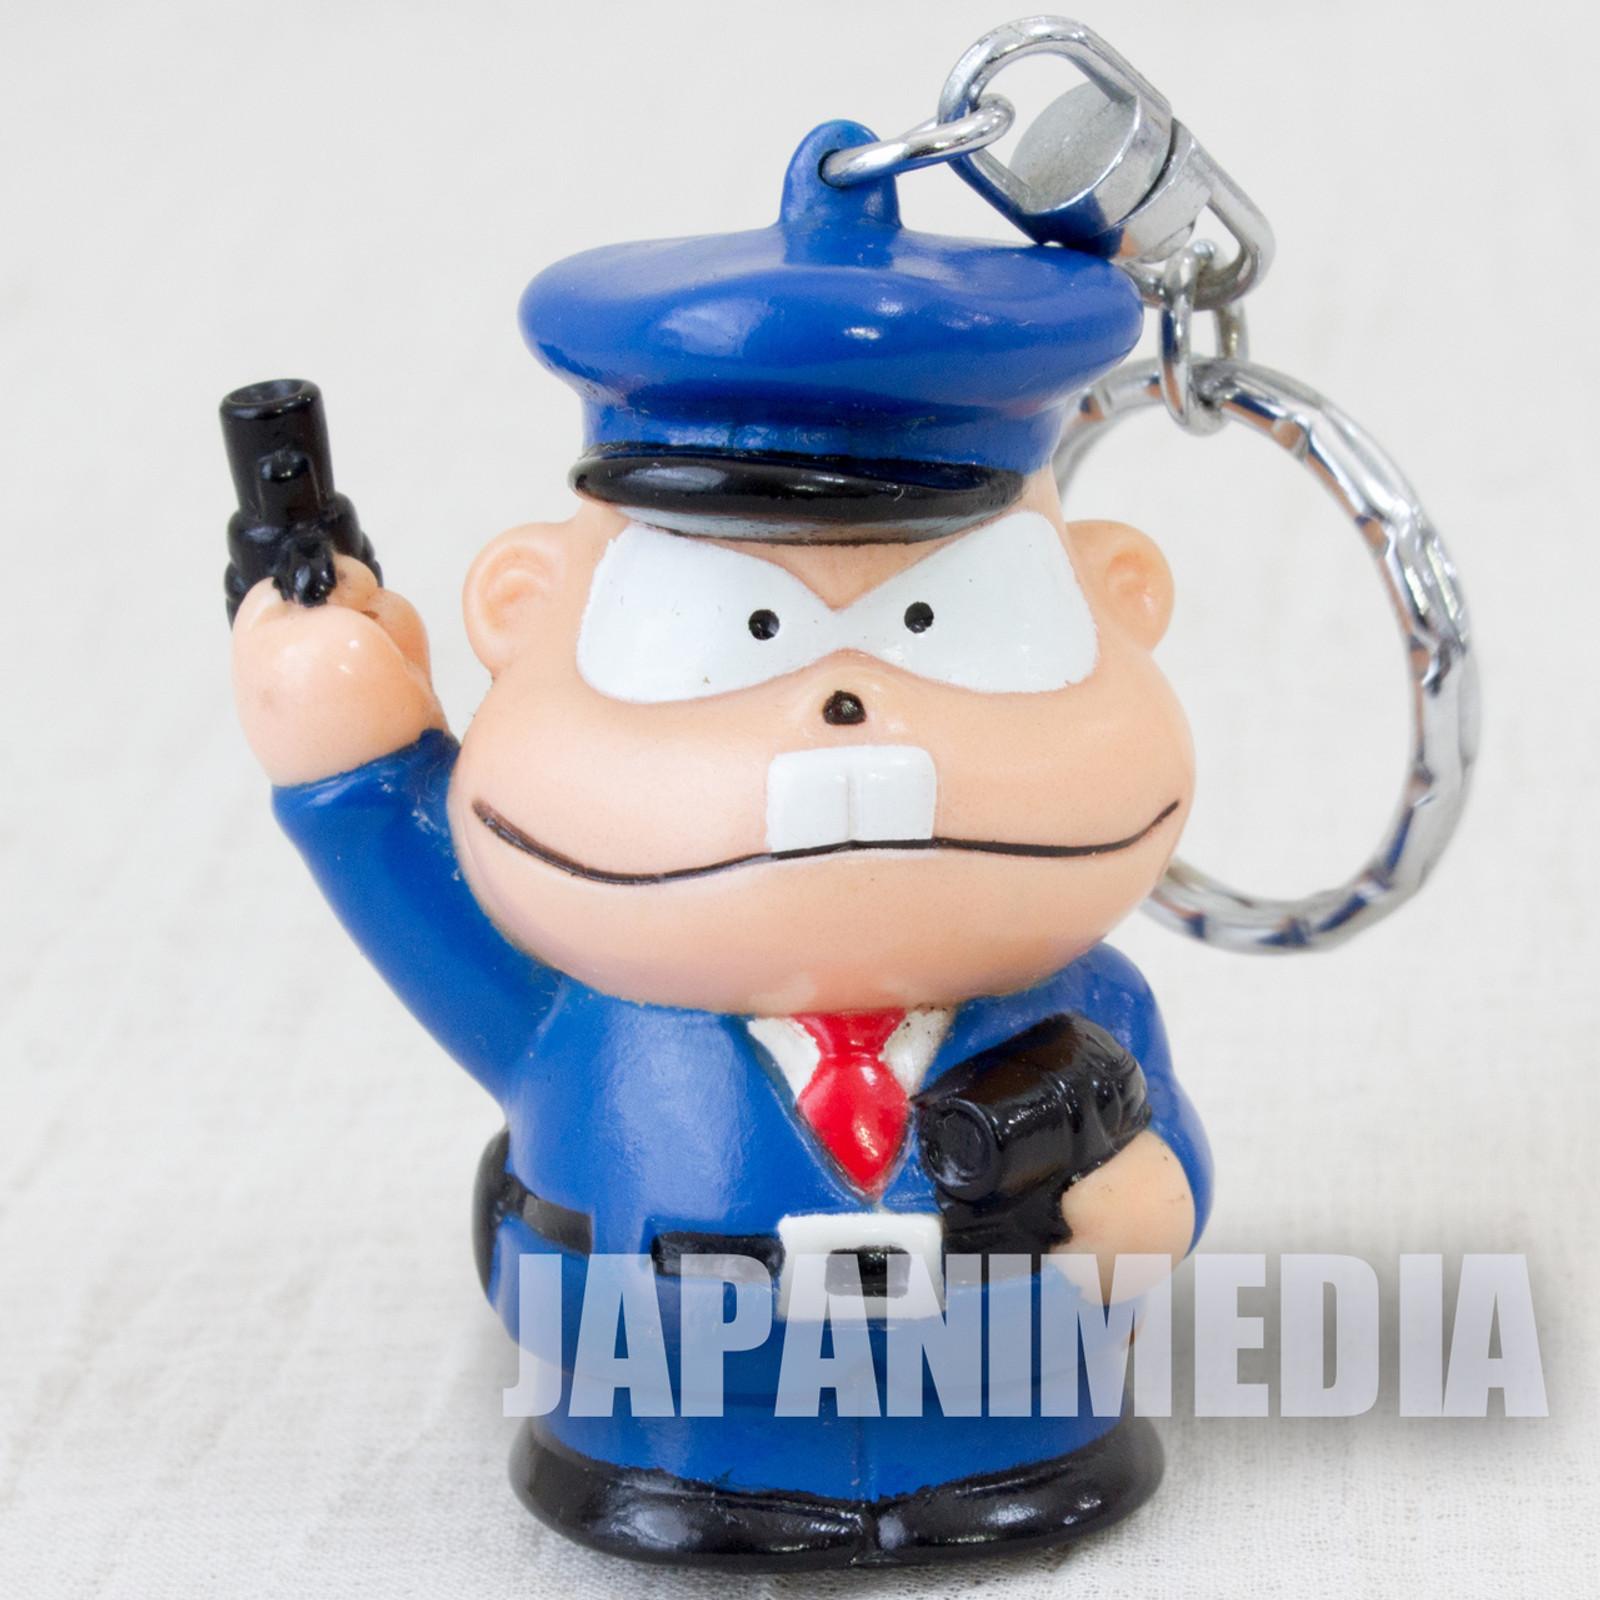 Genius Tensai Bakabon Police Officer Figure Keychain Fujio Akatsuka JAPAN ANIME